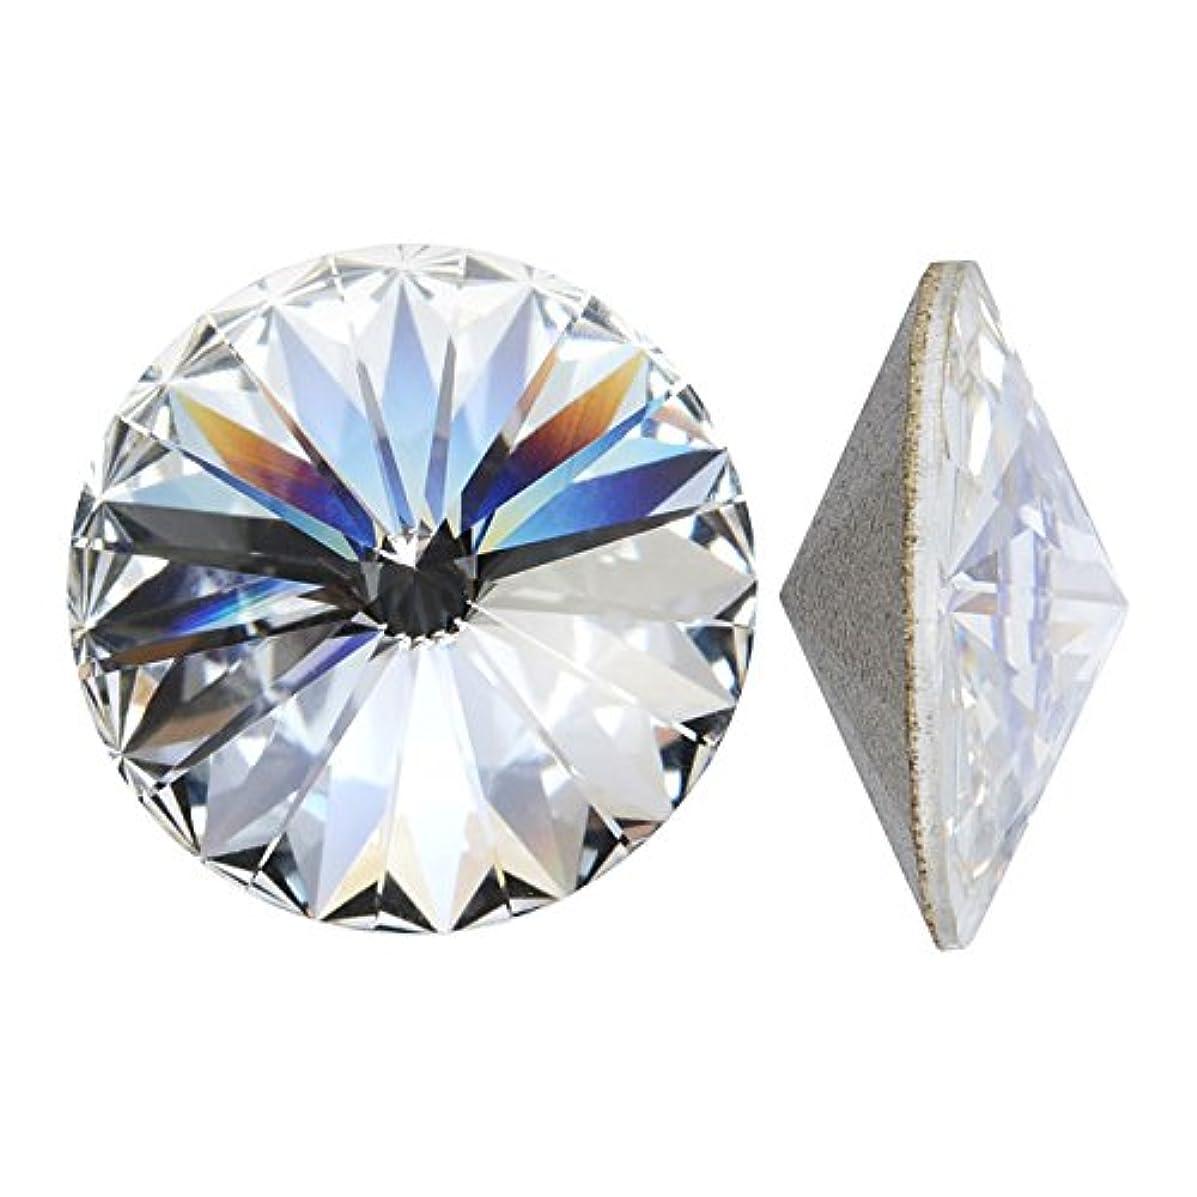 Swarovski Crystal, #1122 Rivoli Fancy Stones 14mm, 2 Pieces, Crystal SF